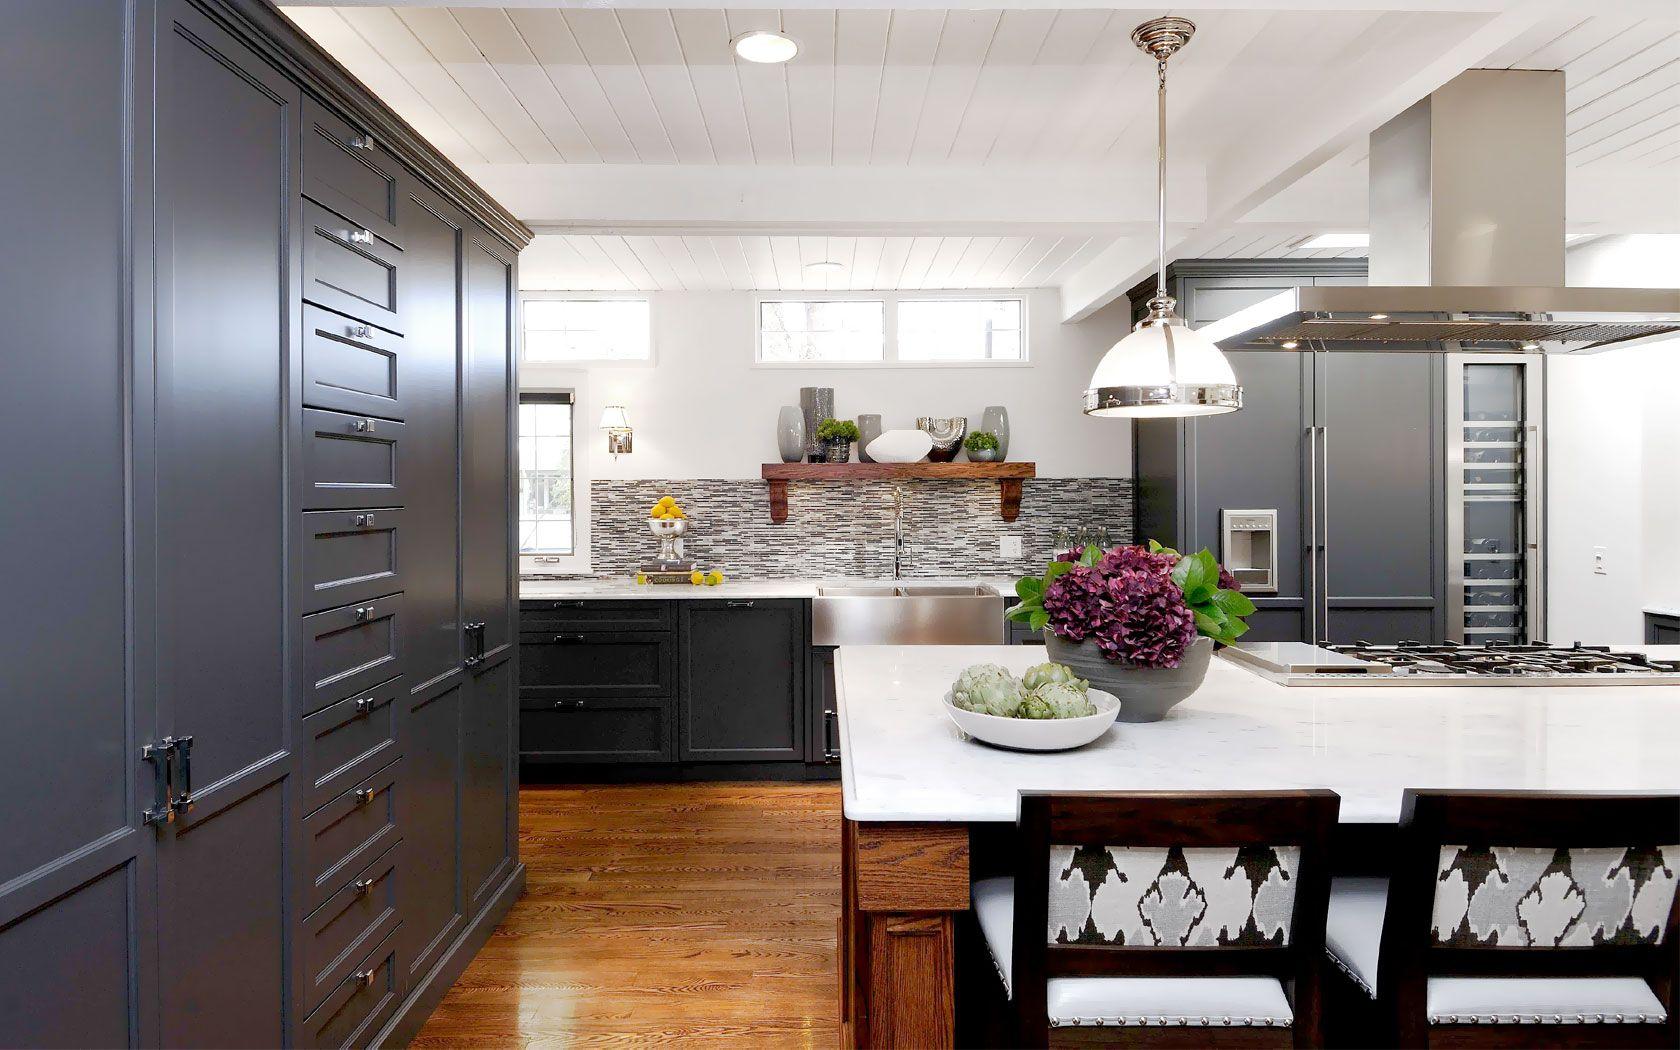 Atmosphere Interior Design  Saskatoon  Dream Homekitchen And Best Kitchens With Grey Cabinets Decorating Inspiration